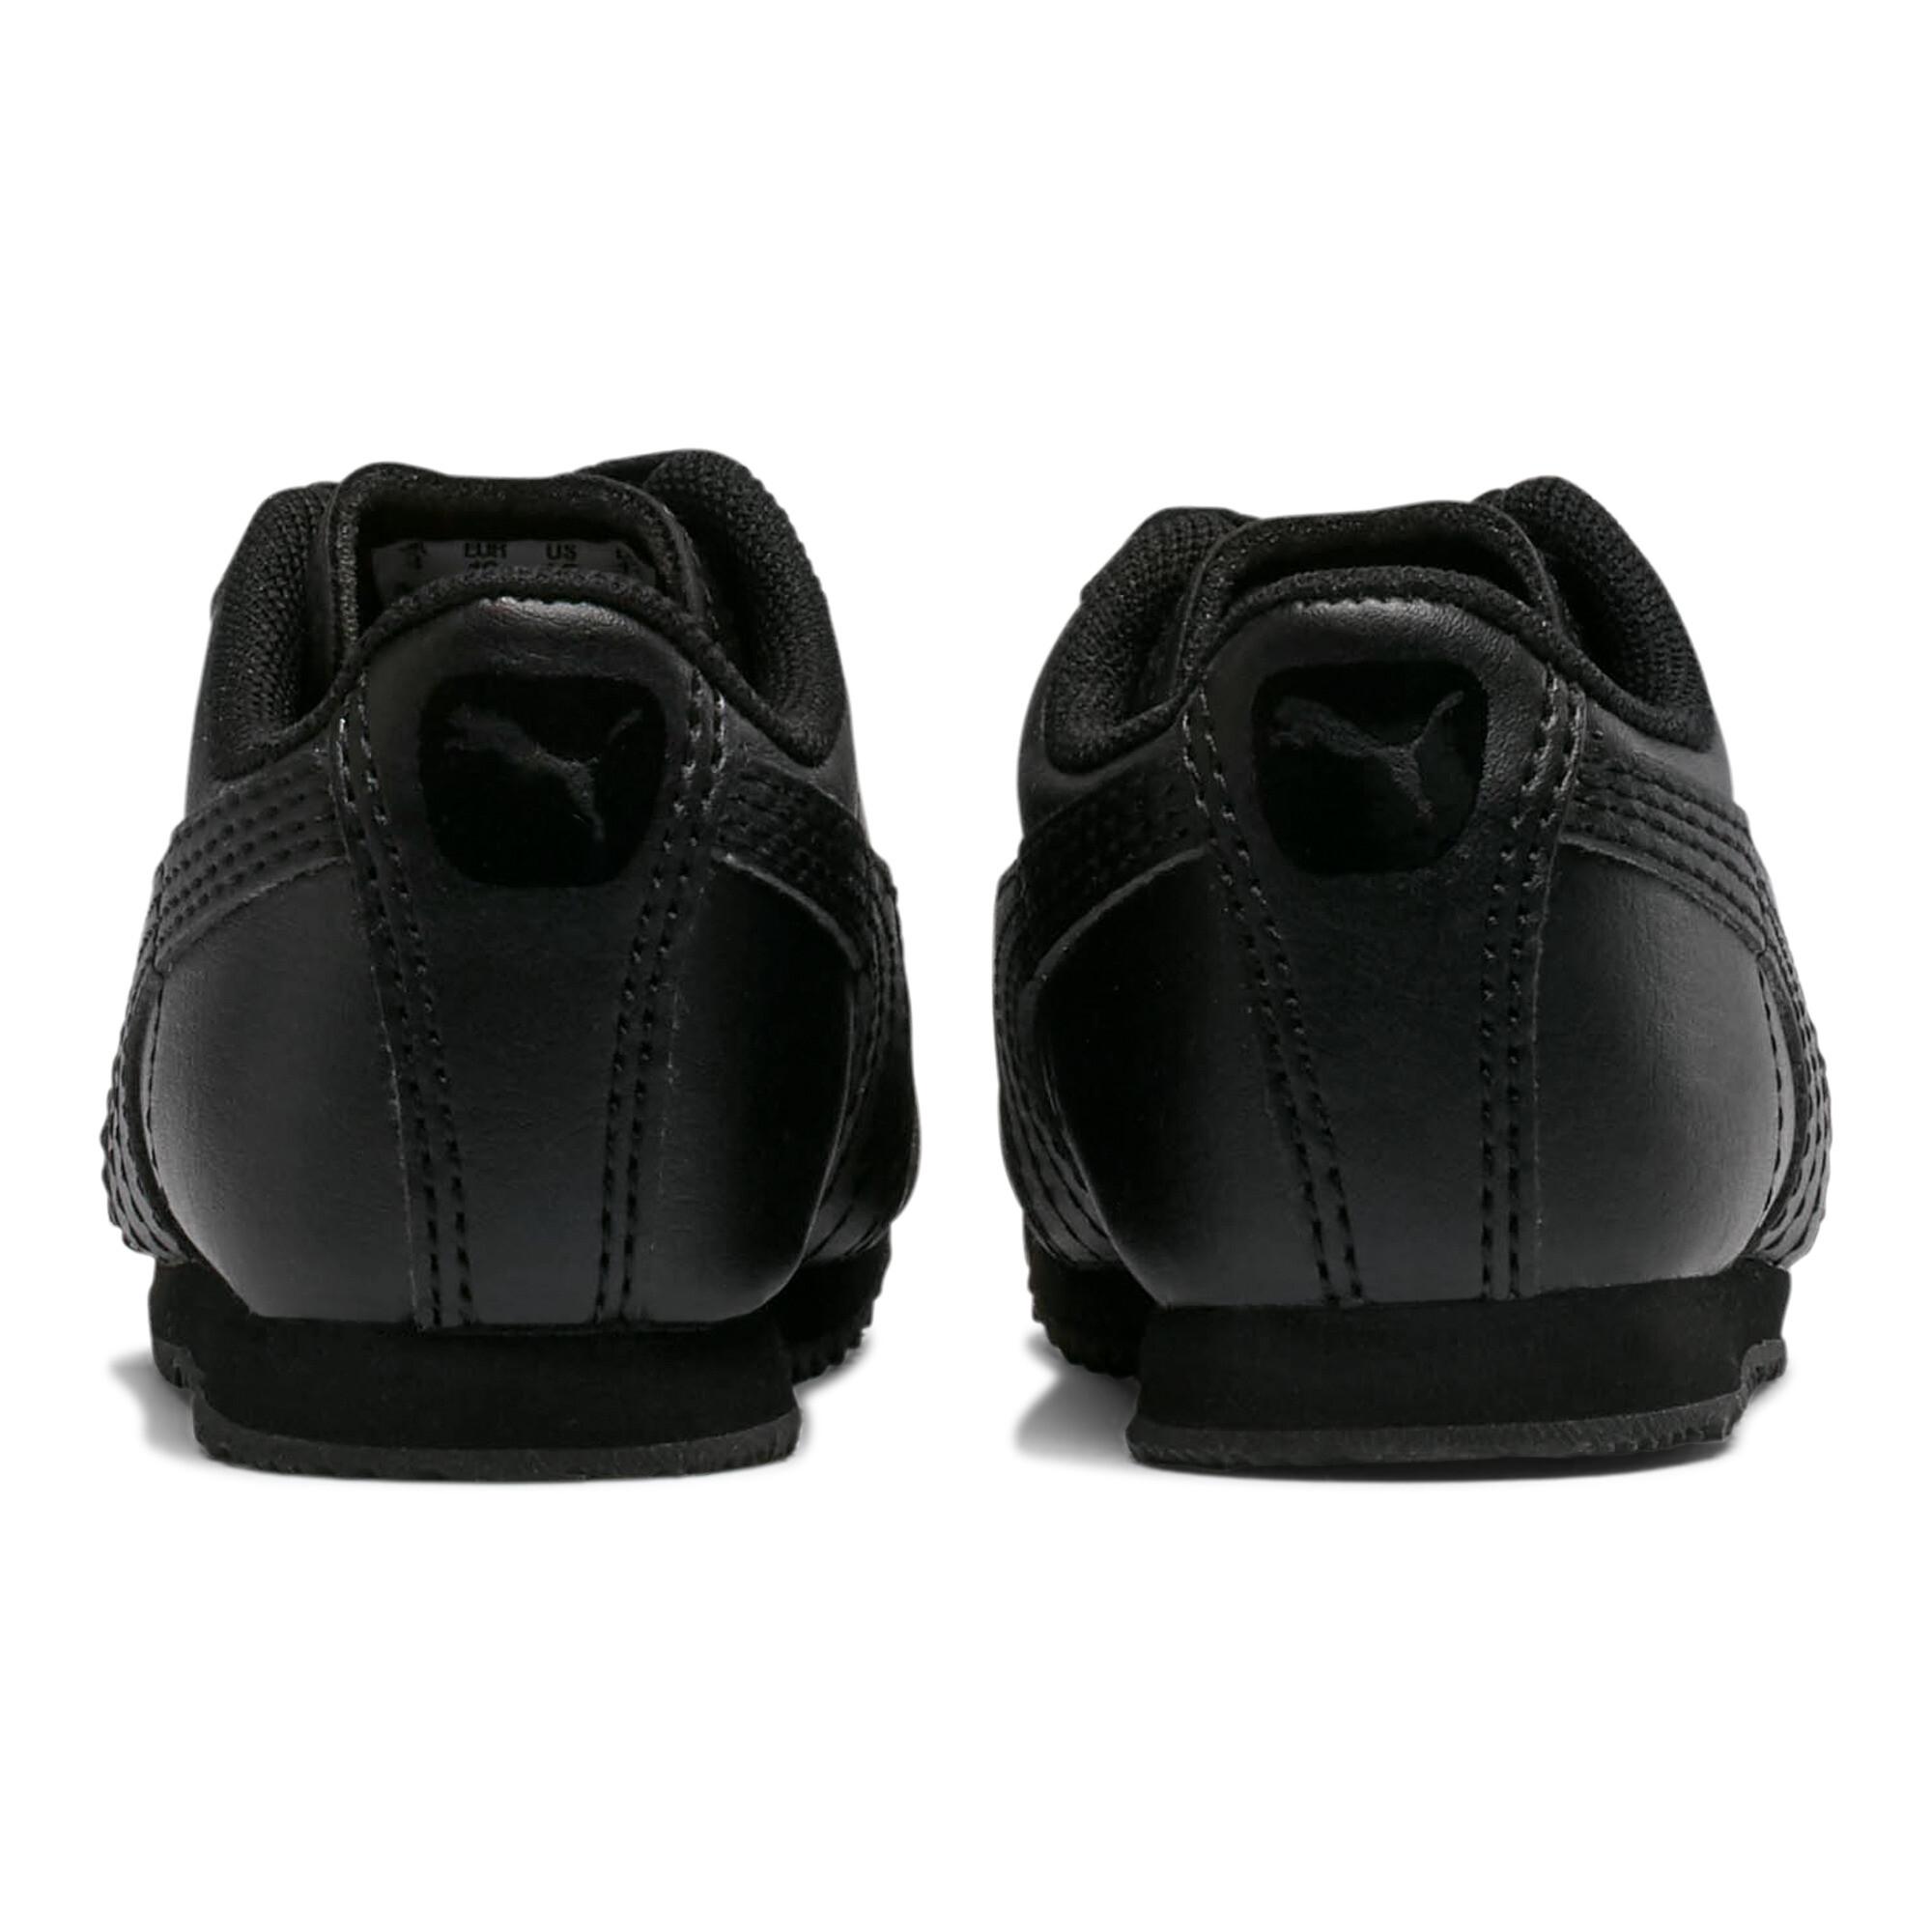 PUMA Roma Basic Toddler Shoes Kids Shoe Kids